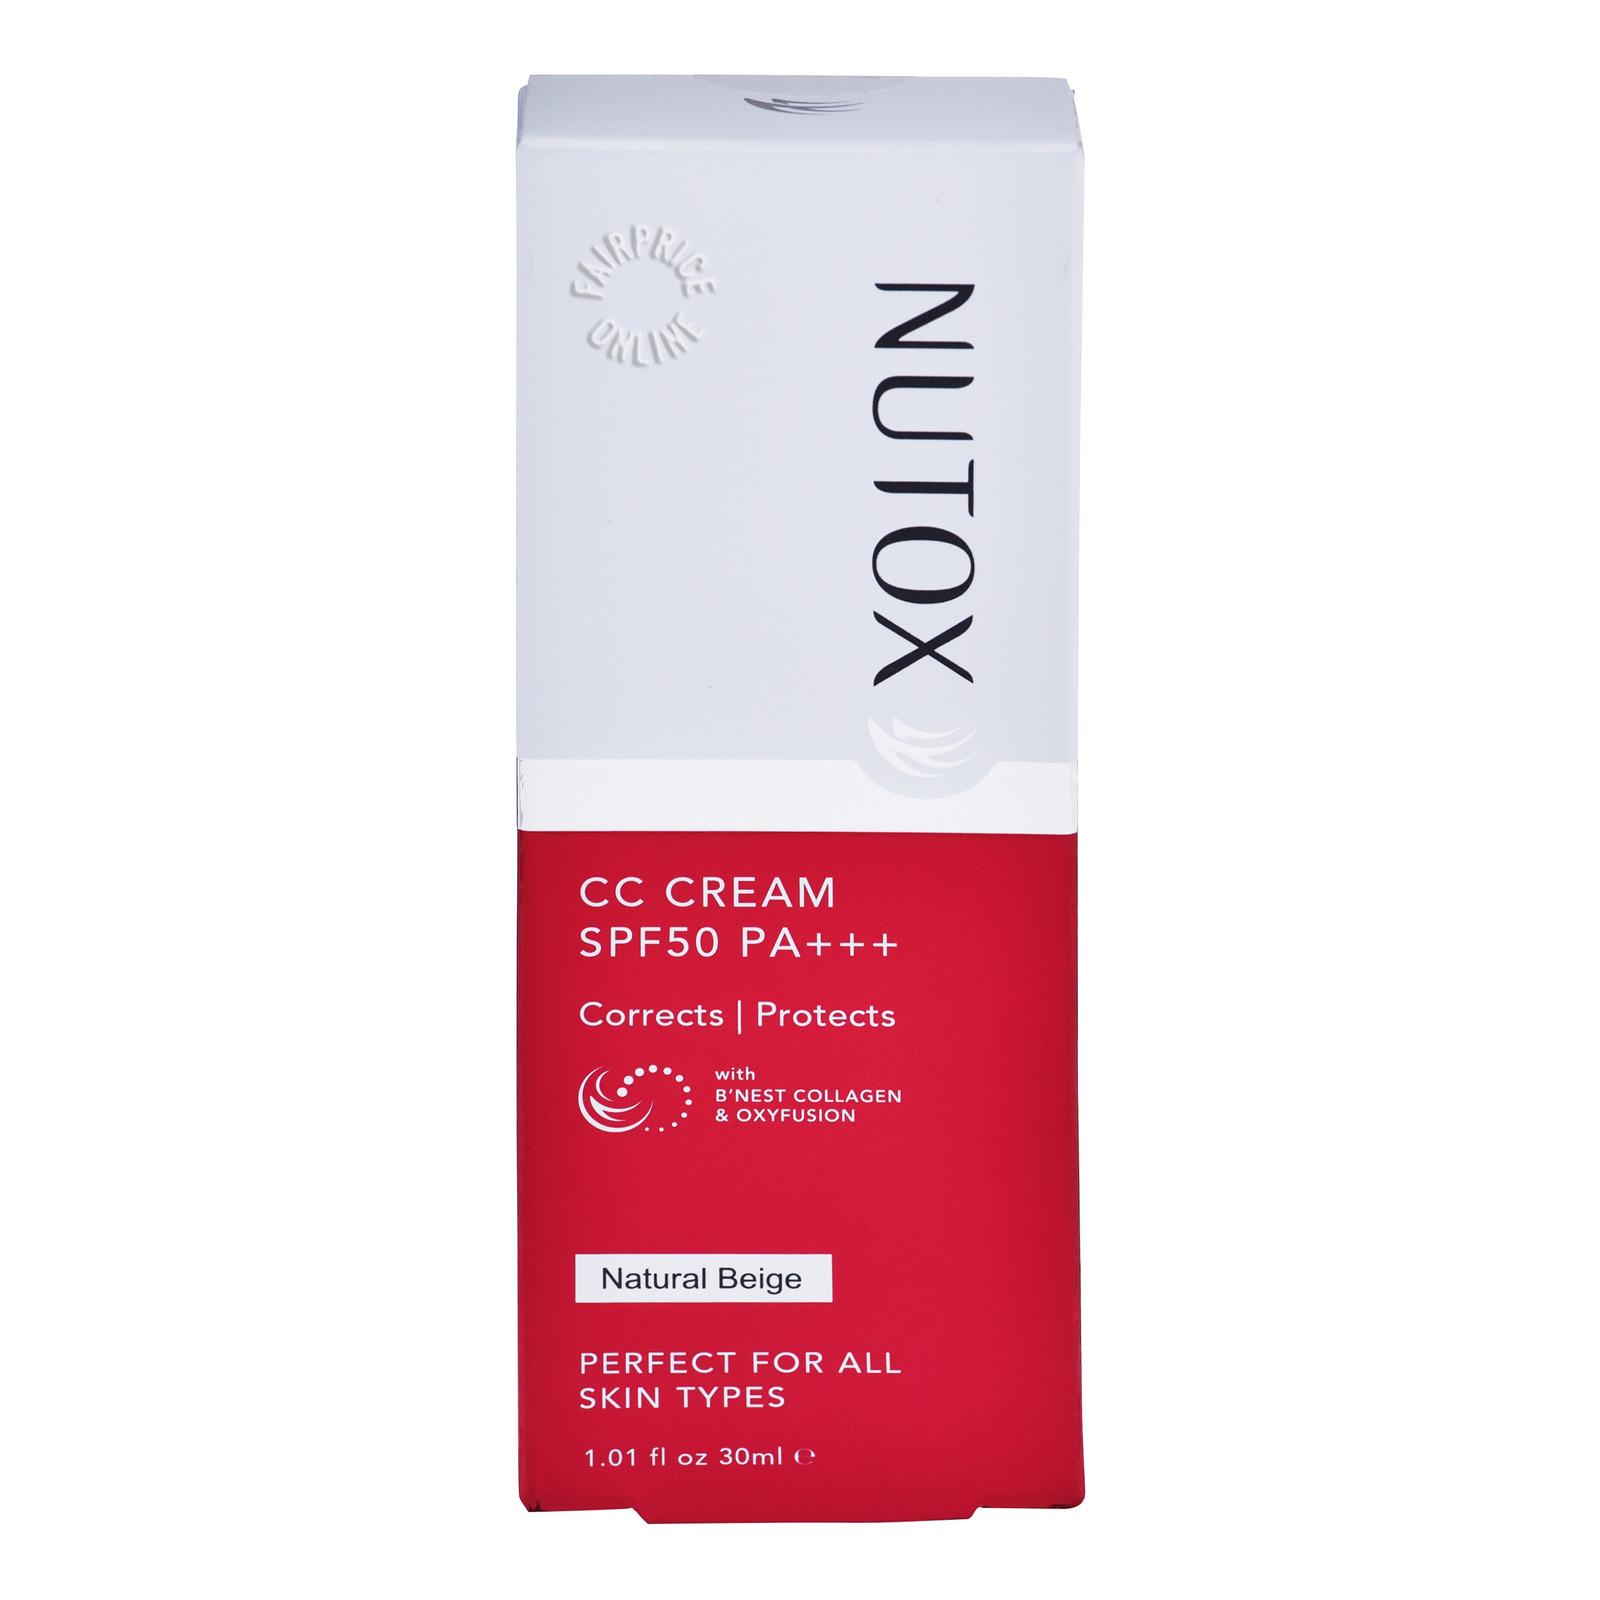 Nutox CC Cream - Natural Beige (SPF 50)